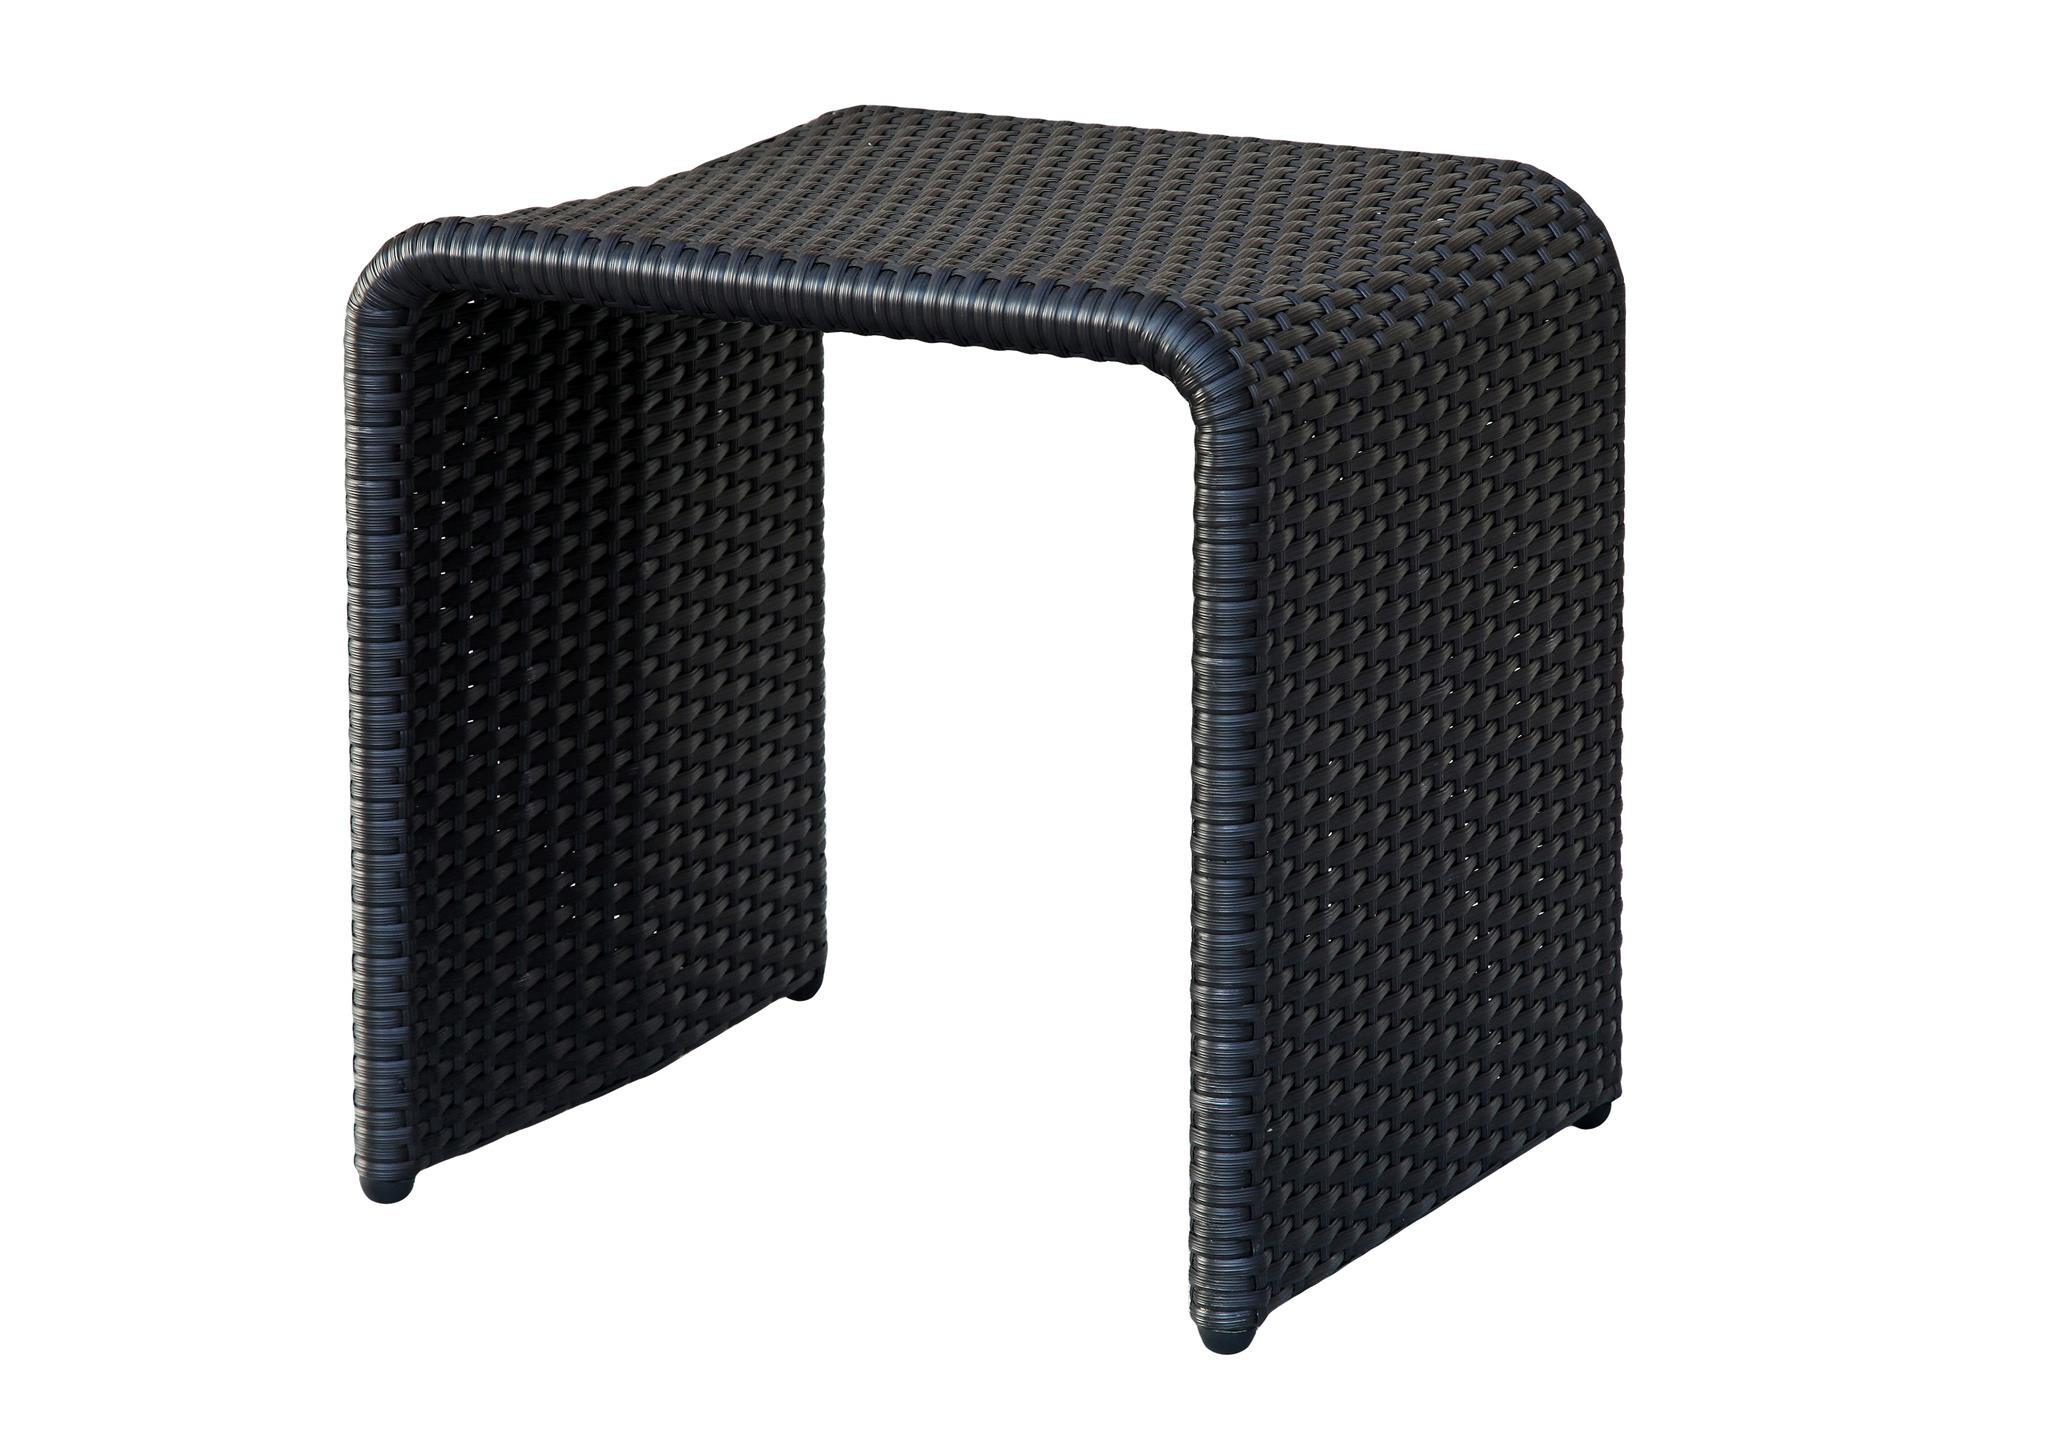 ㄇ型編藤凳